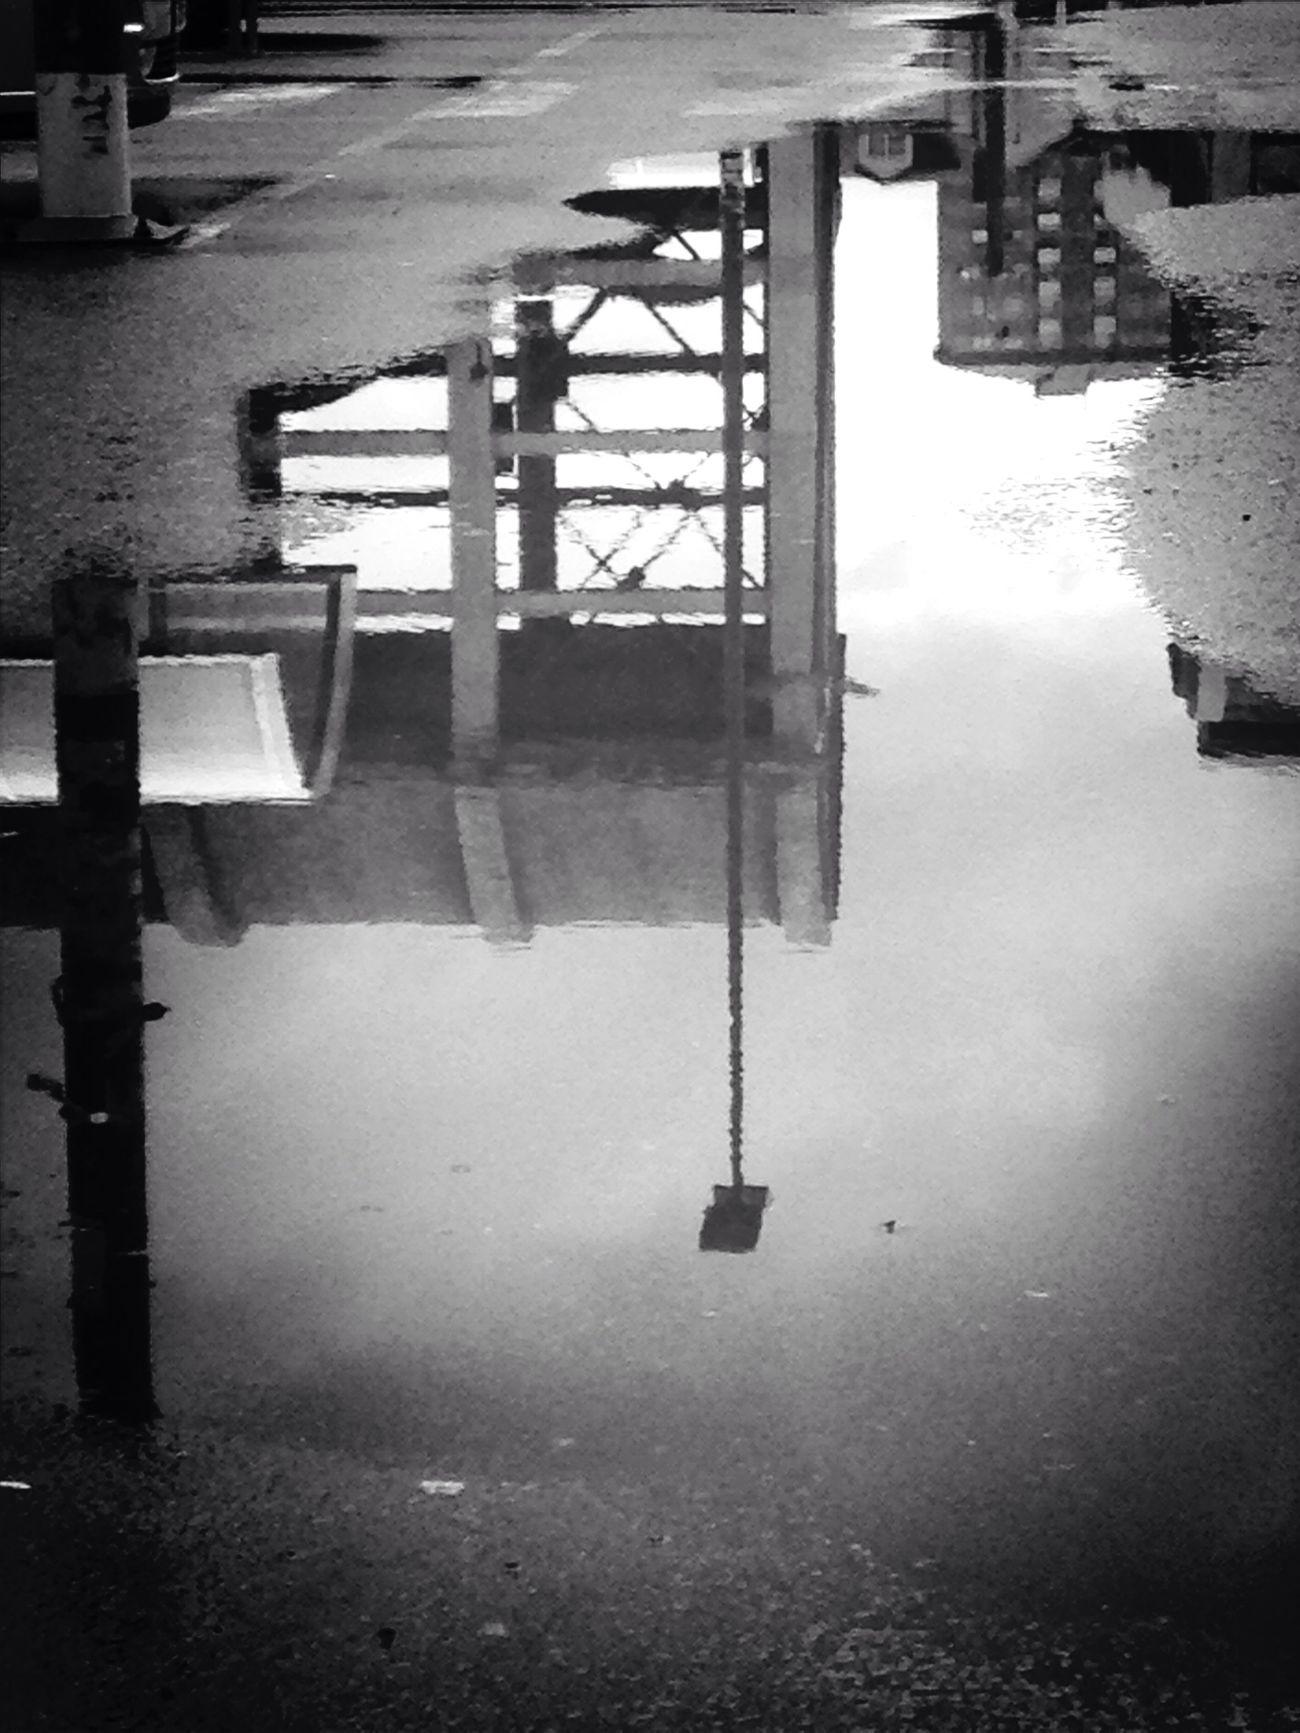 airtsudni Blancoynegro Reflection A Coruña Elwood